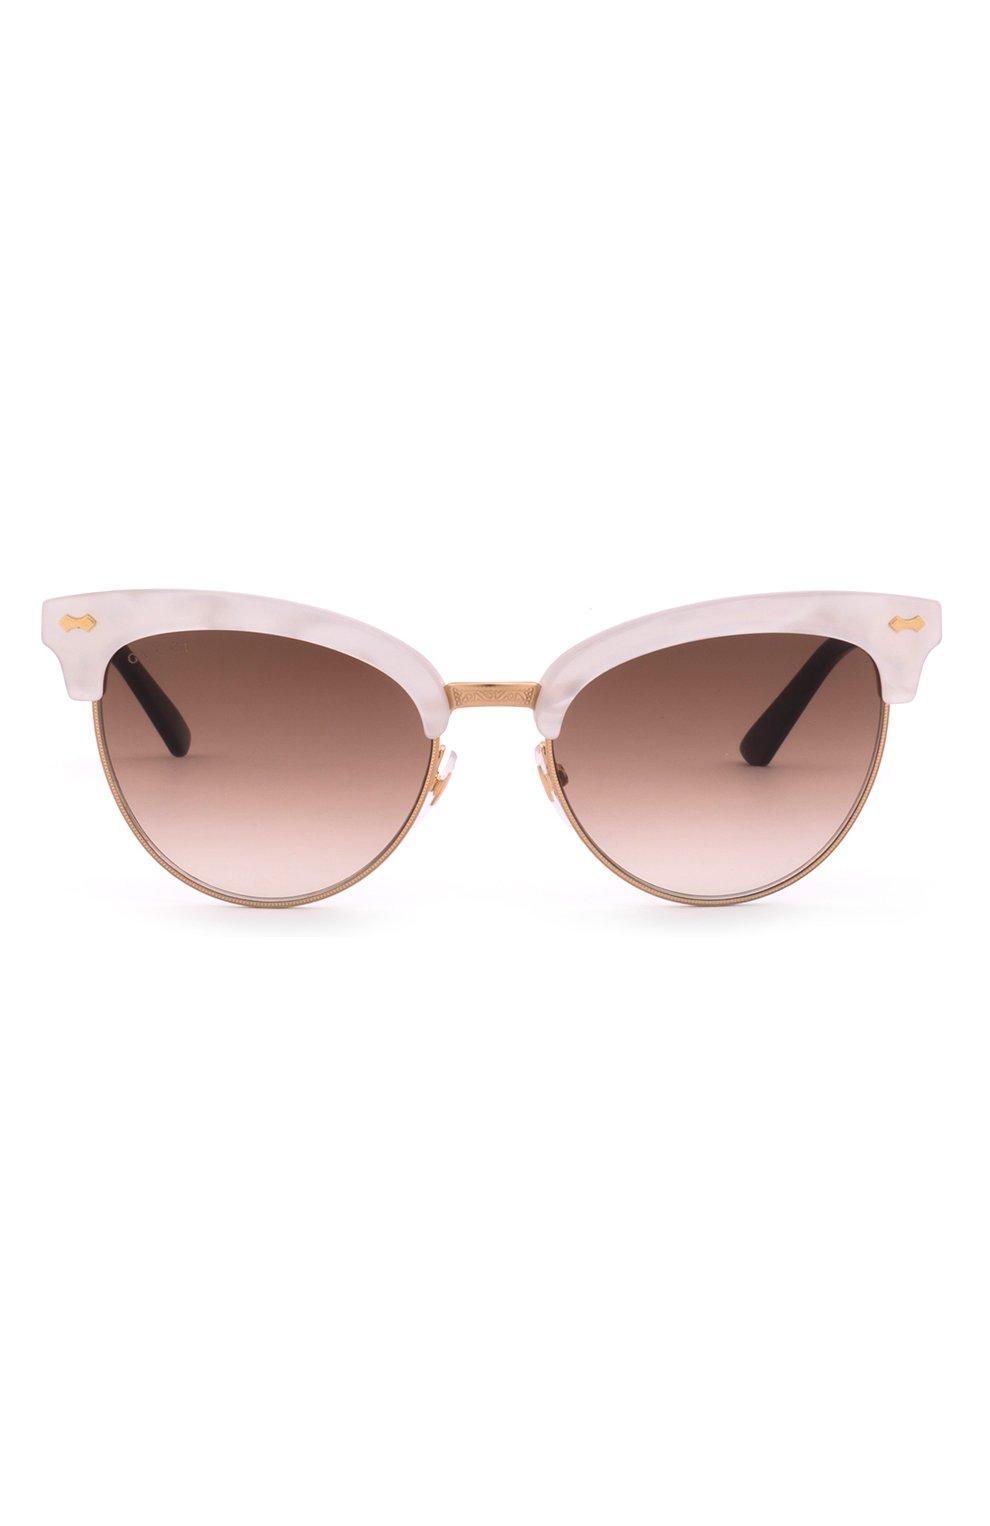 Женские солнцезащитные очки GUCCI розового цвета, арт. 4283 U29   Фото 1